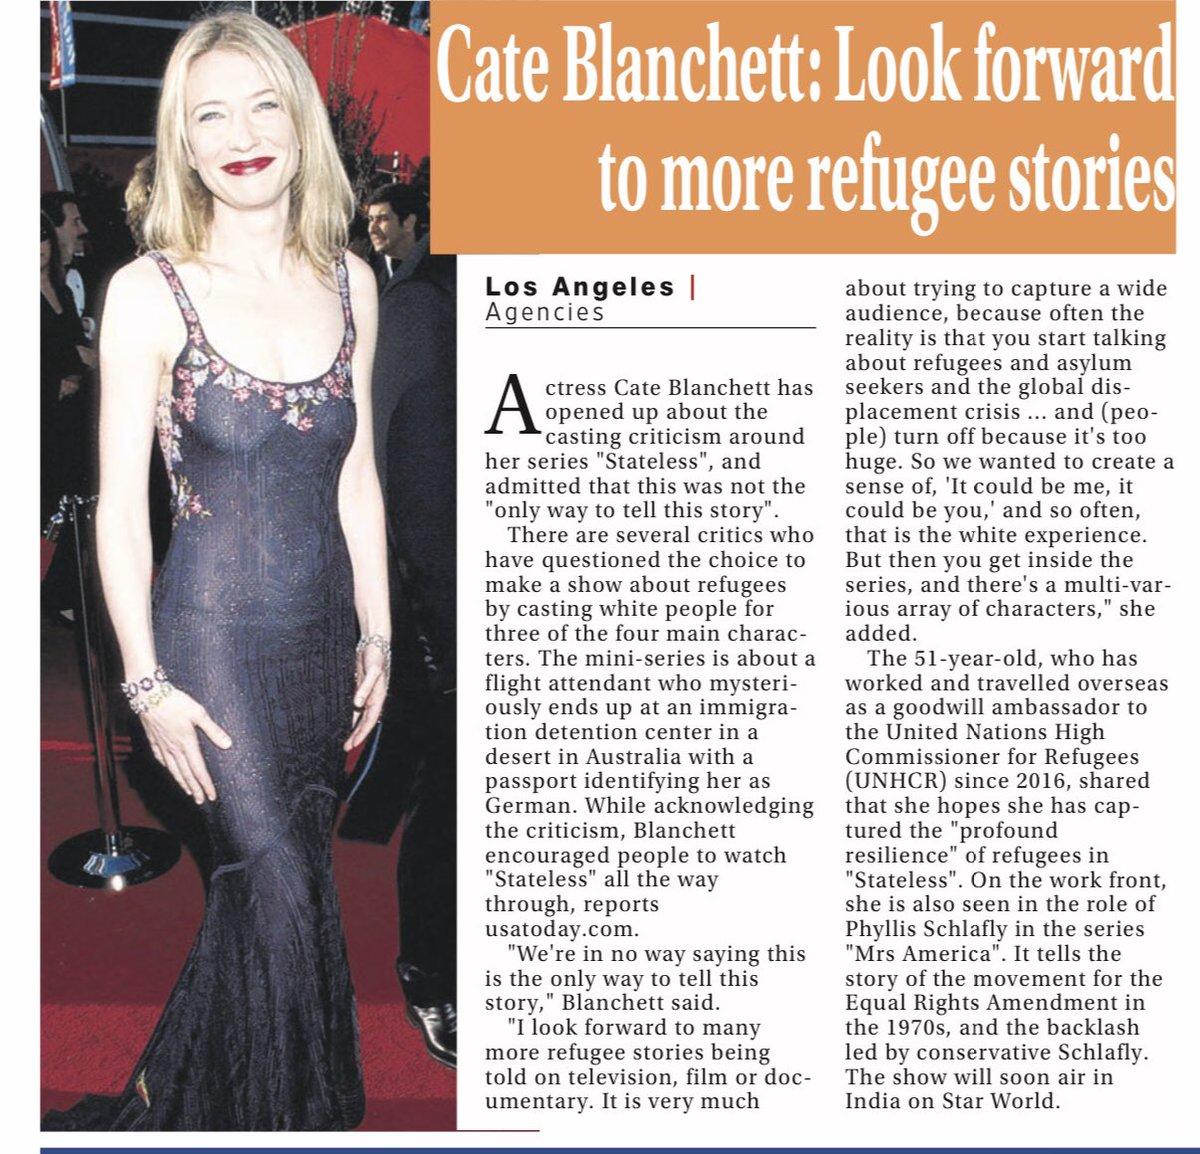 @CateBlanchettC #Hollywood https://t.co/4TH34DaPKK